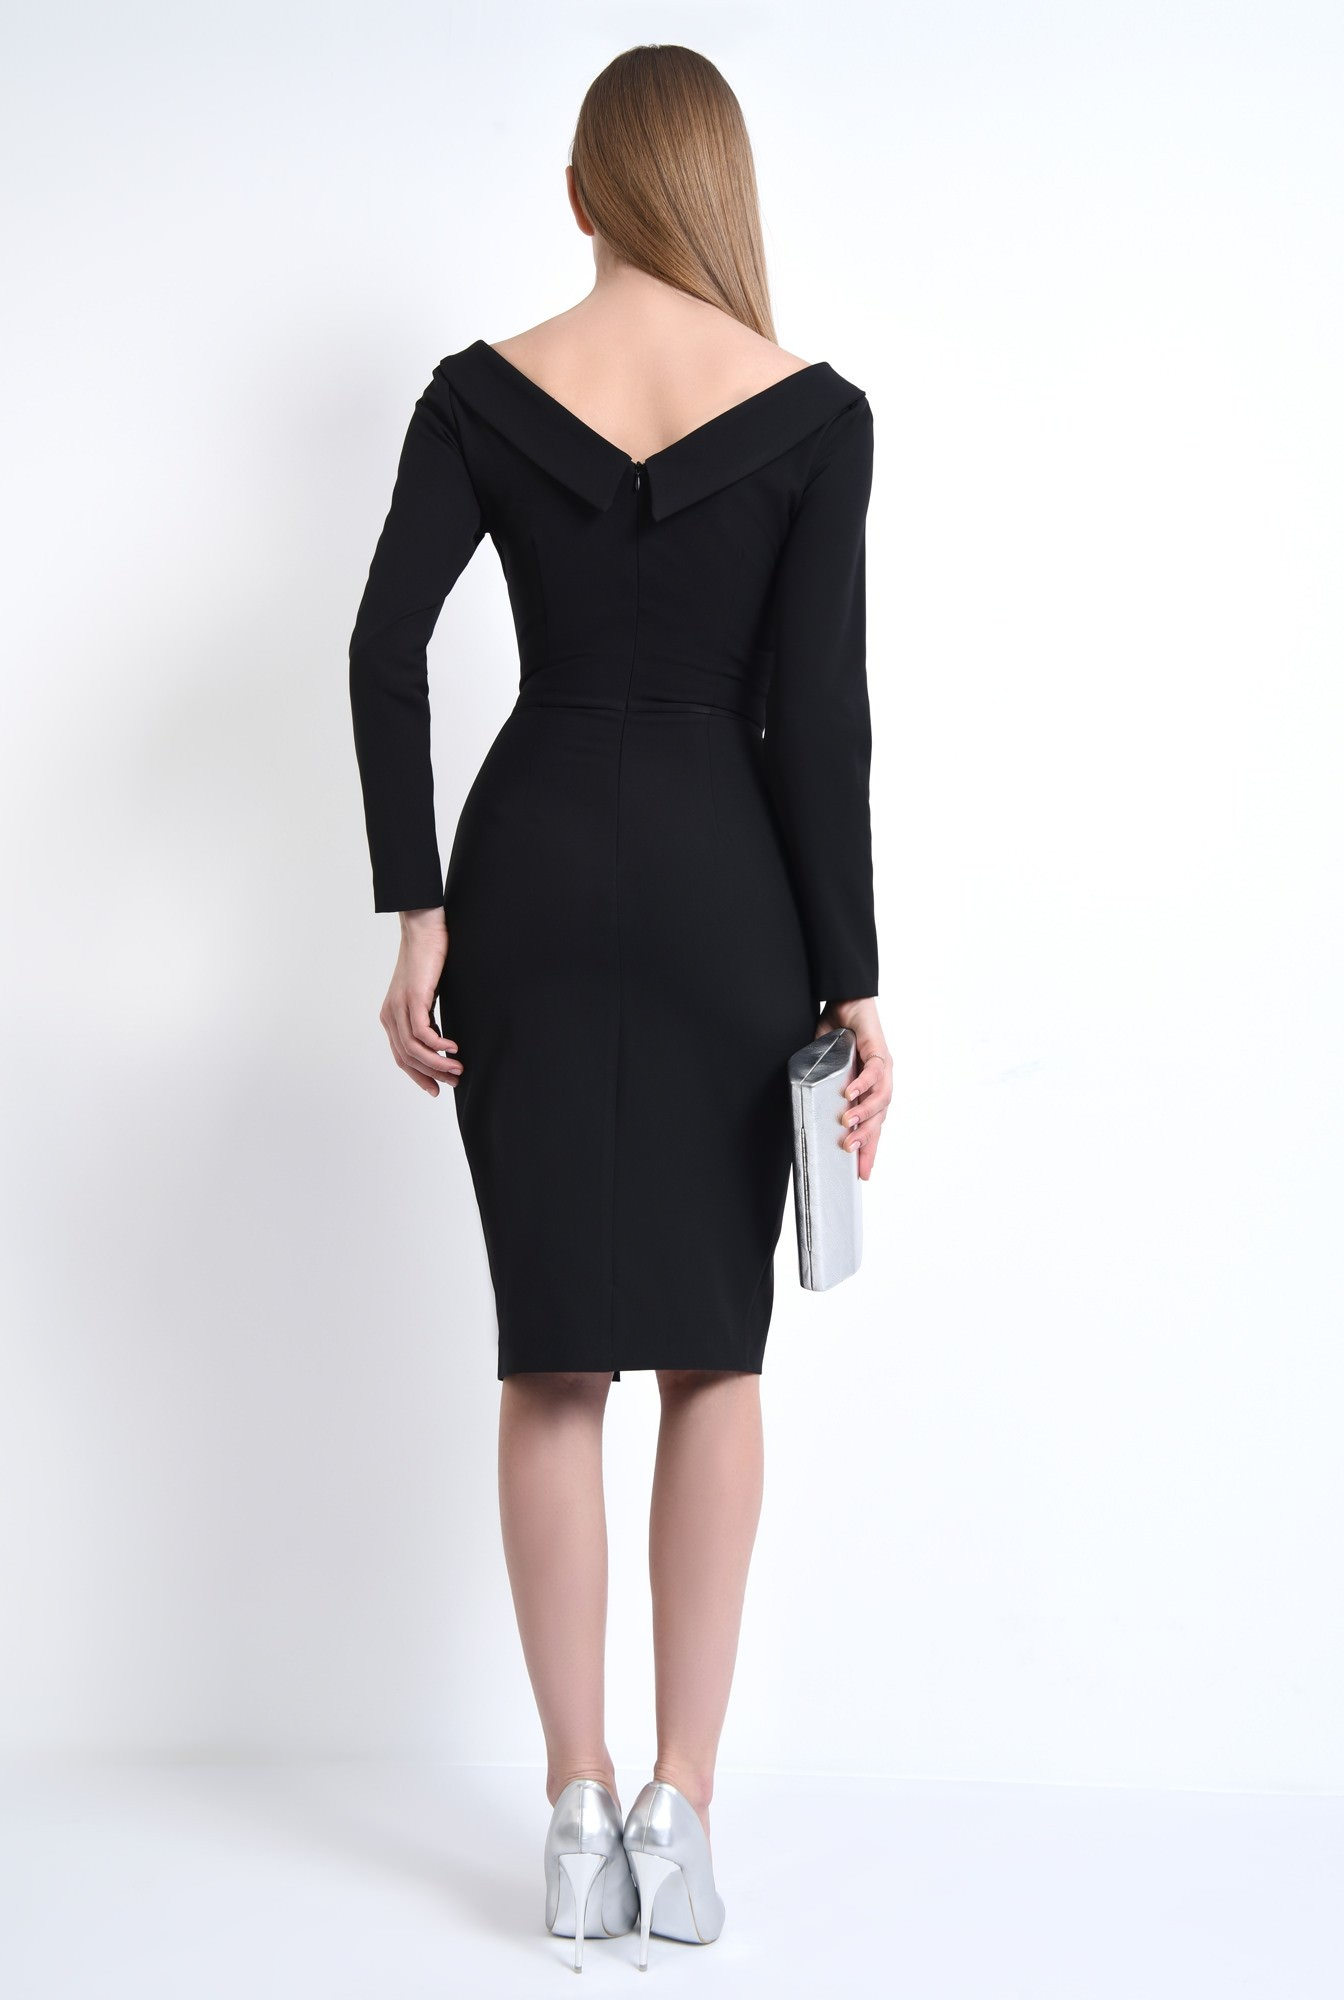 1 - Rochie eleganta neagra, midi